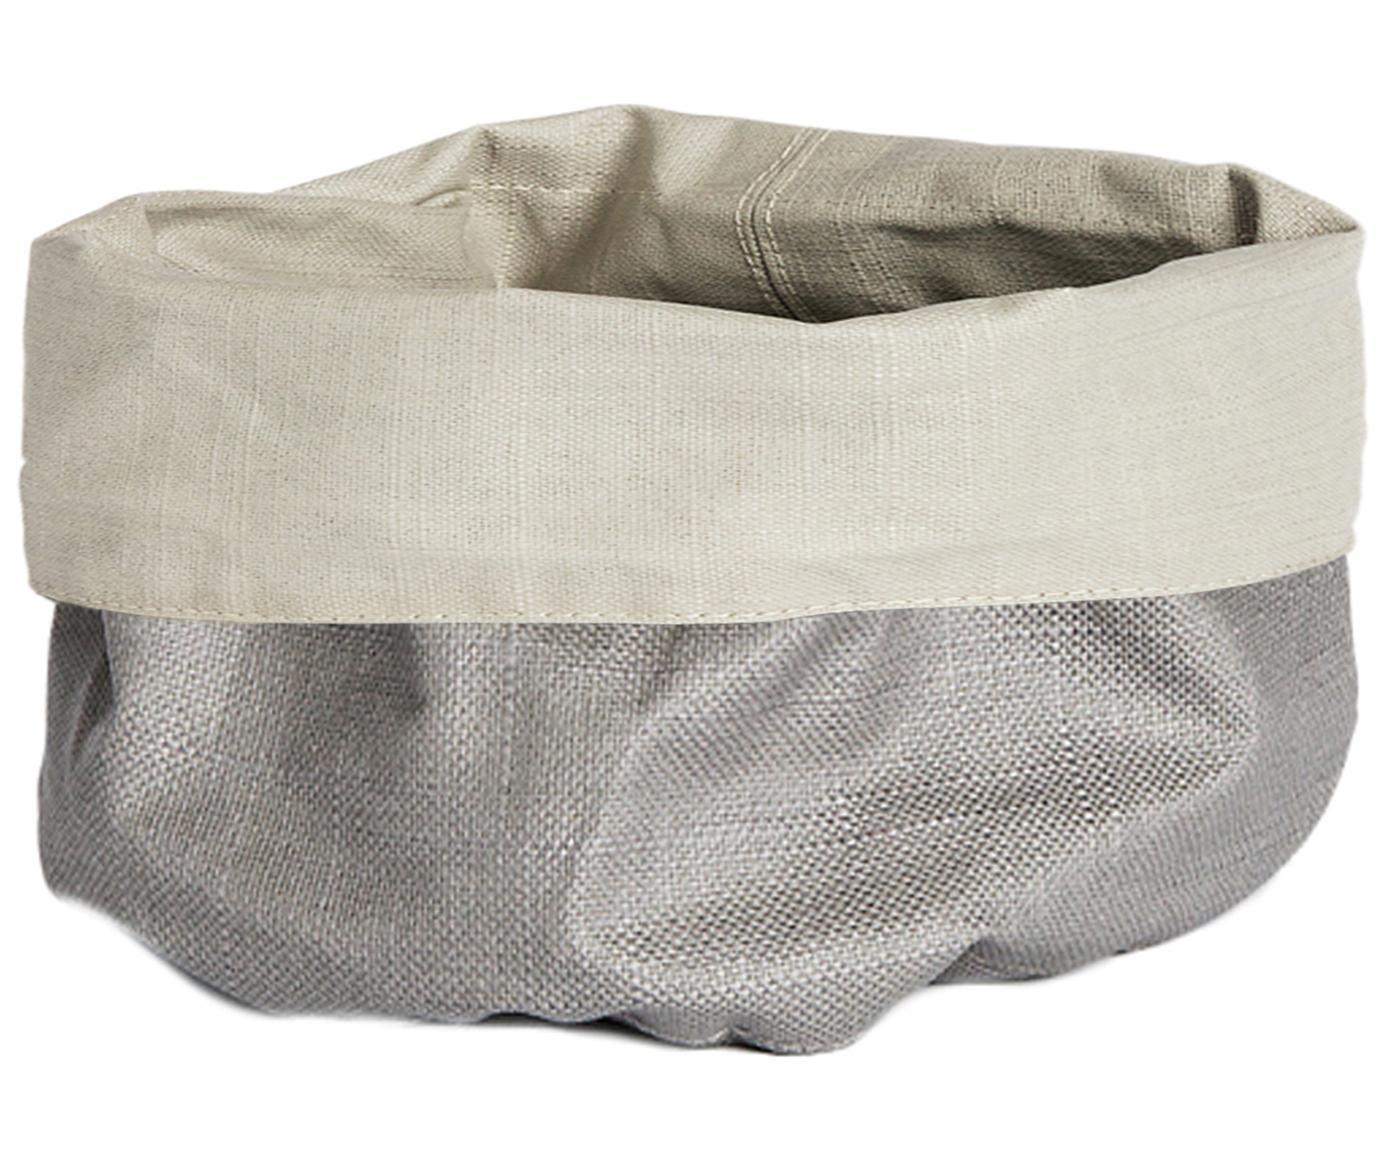 Panera pequeña de lino Patinn, 55%lino, 45%algodón, recubierto en poliuretano, Beige, gris claro, Ø 16 x Al 20 cm